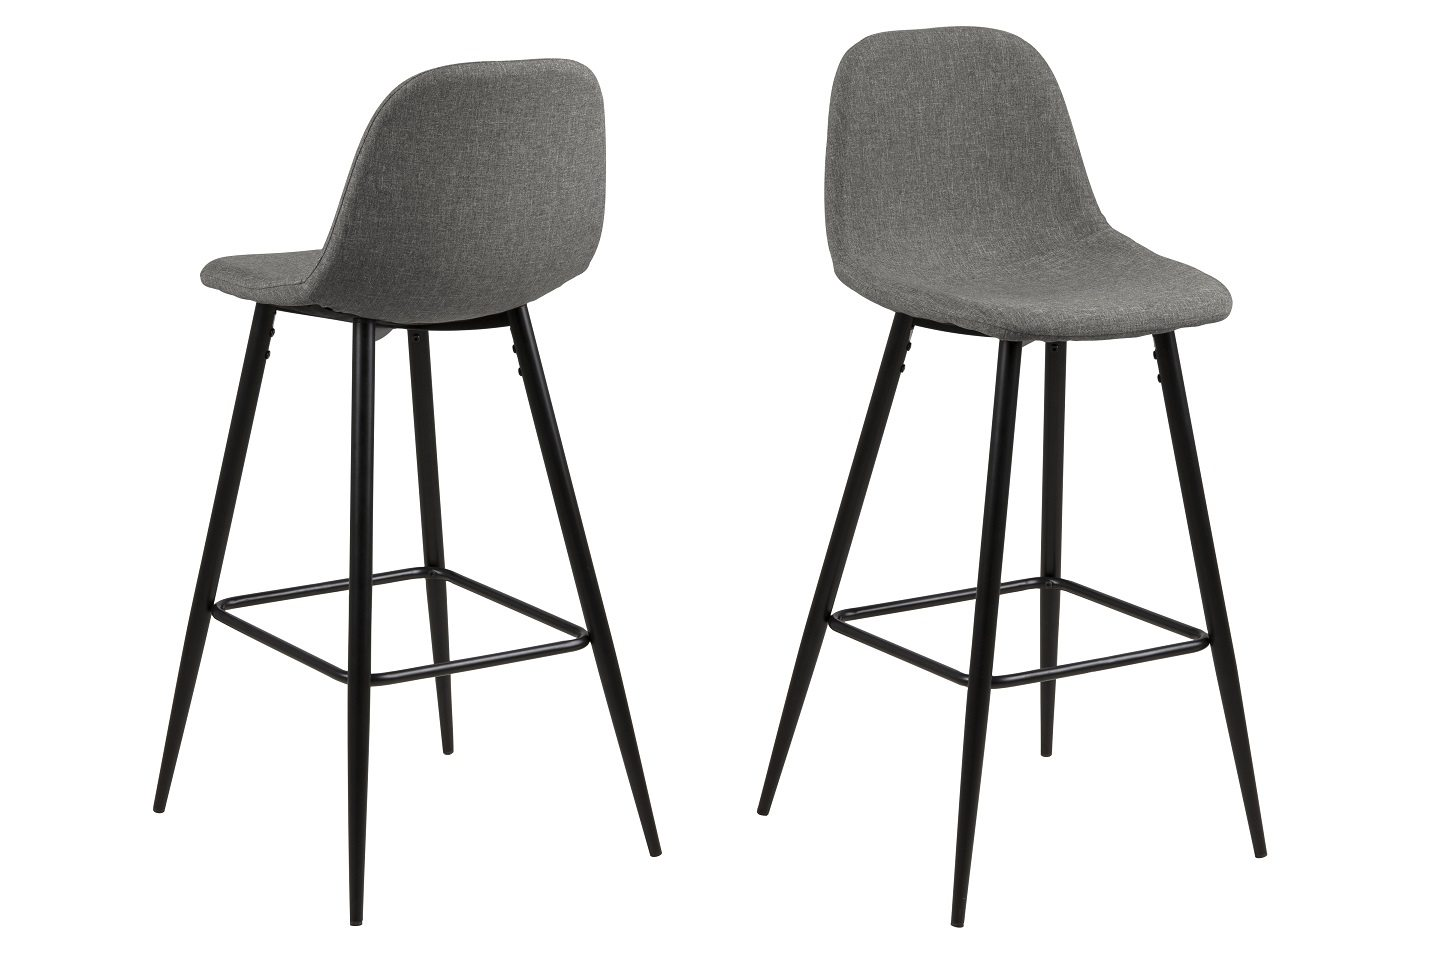 wilma-bar-stool-web